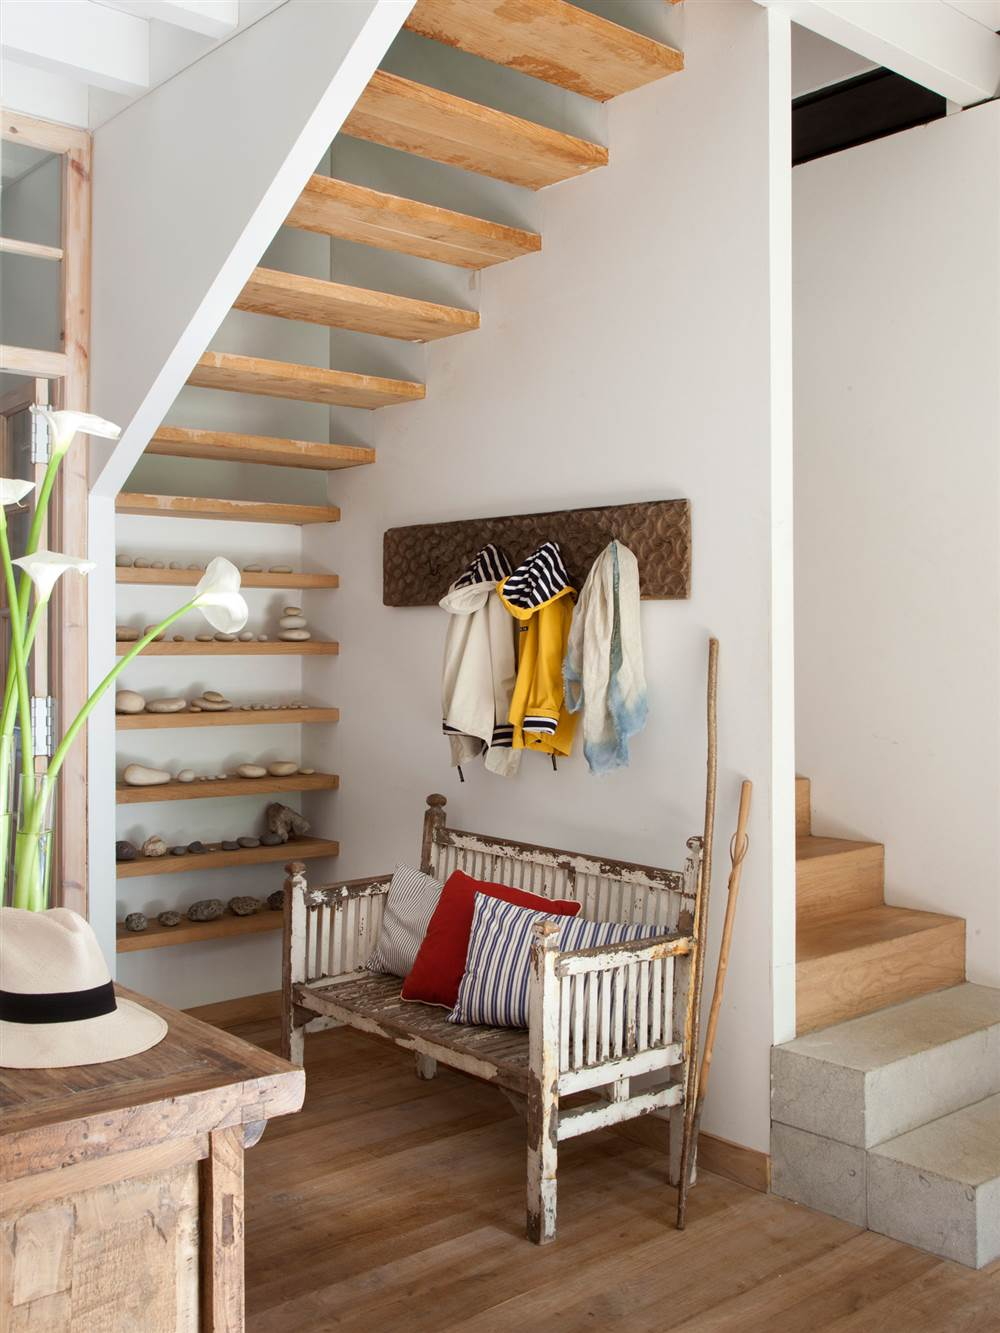 Aprovecha el hueco bajo la escalera for Escaleras duplex fotos